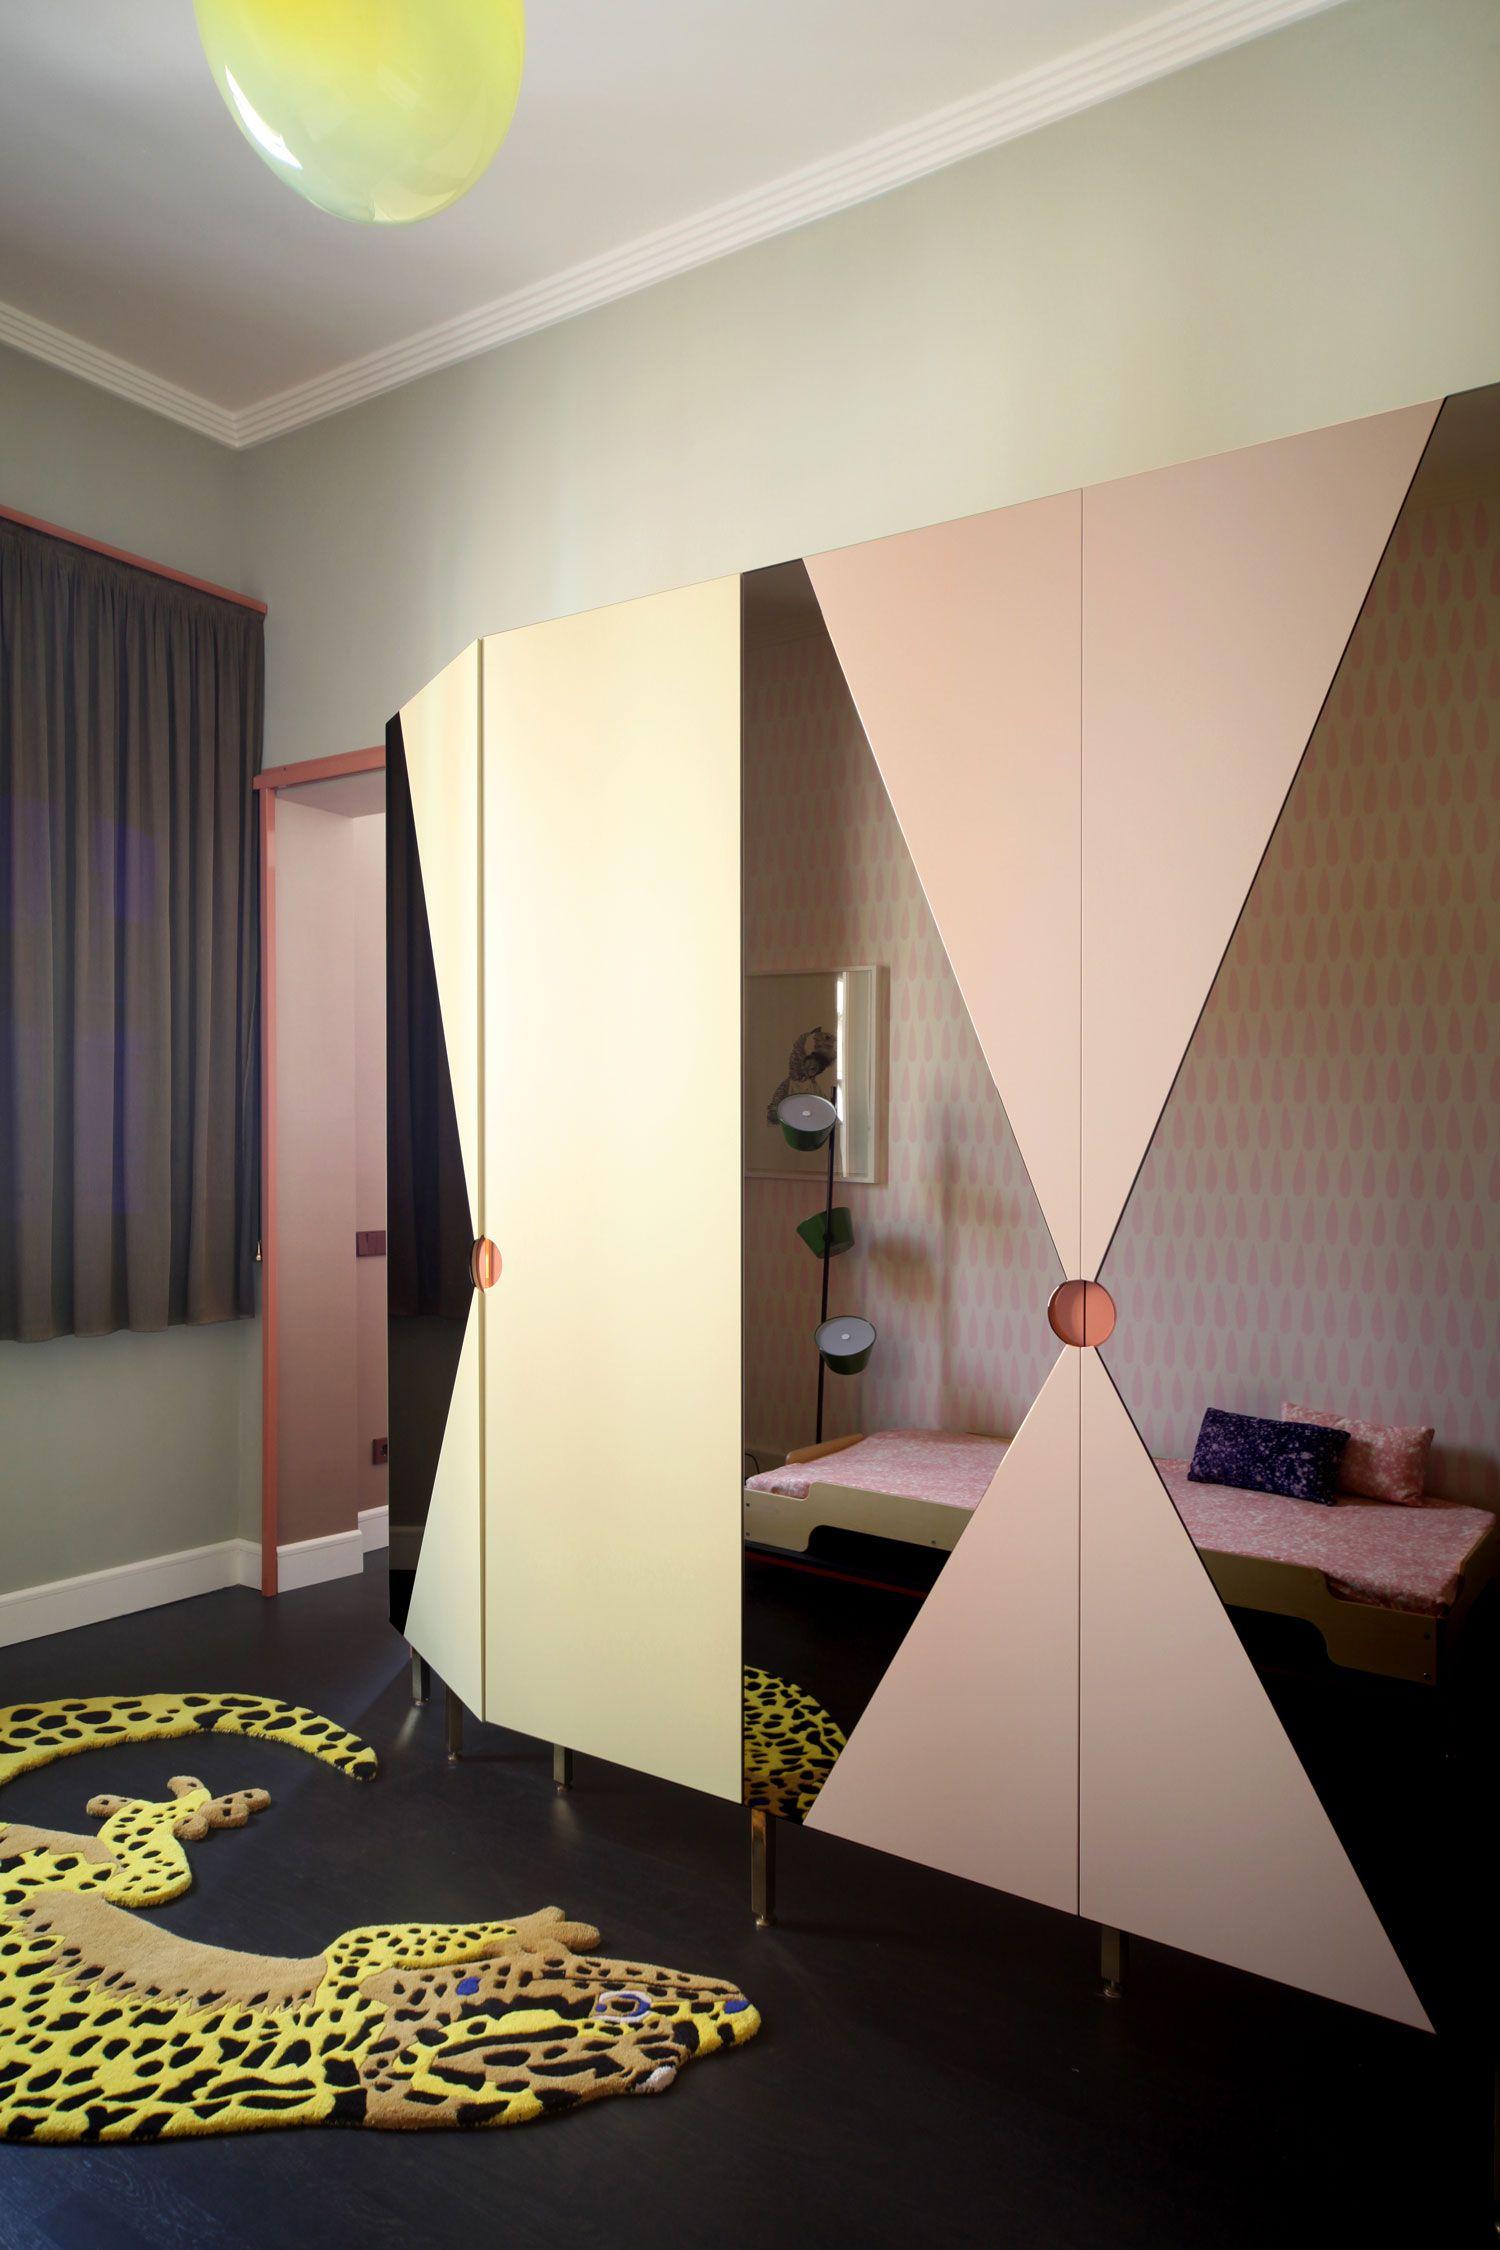 Wardrobe design Extraordinary Heritage Apartment Renovation in Venice by Marcante